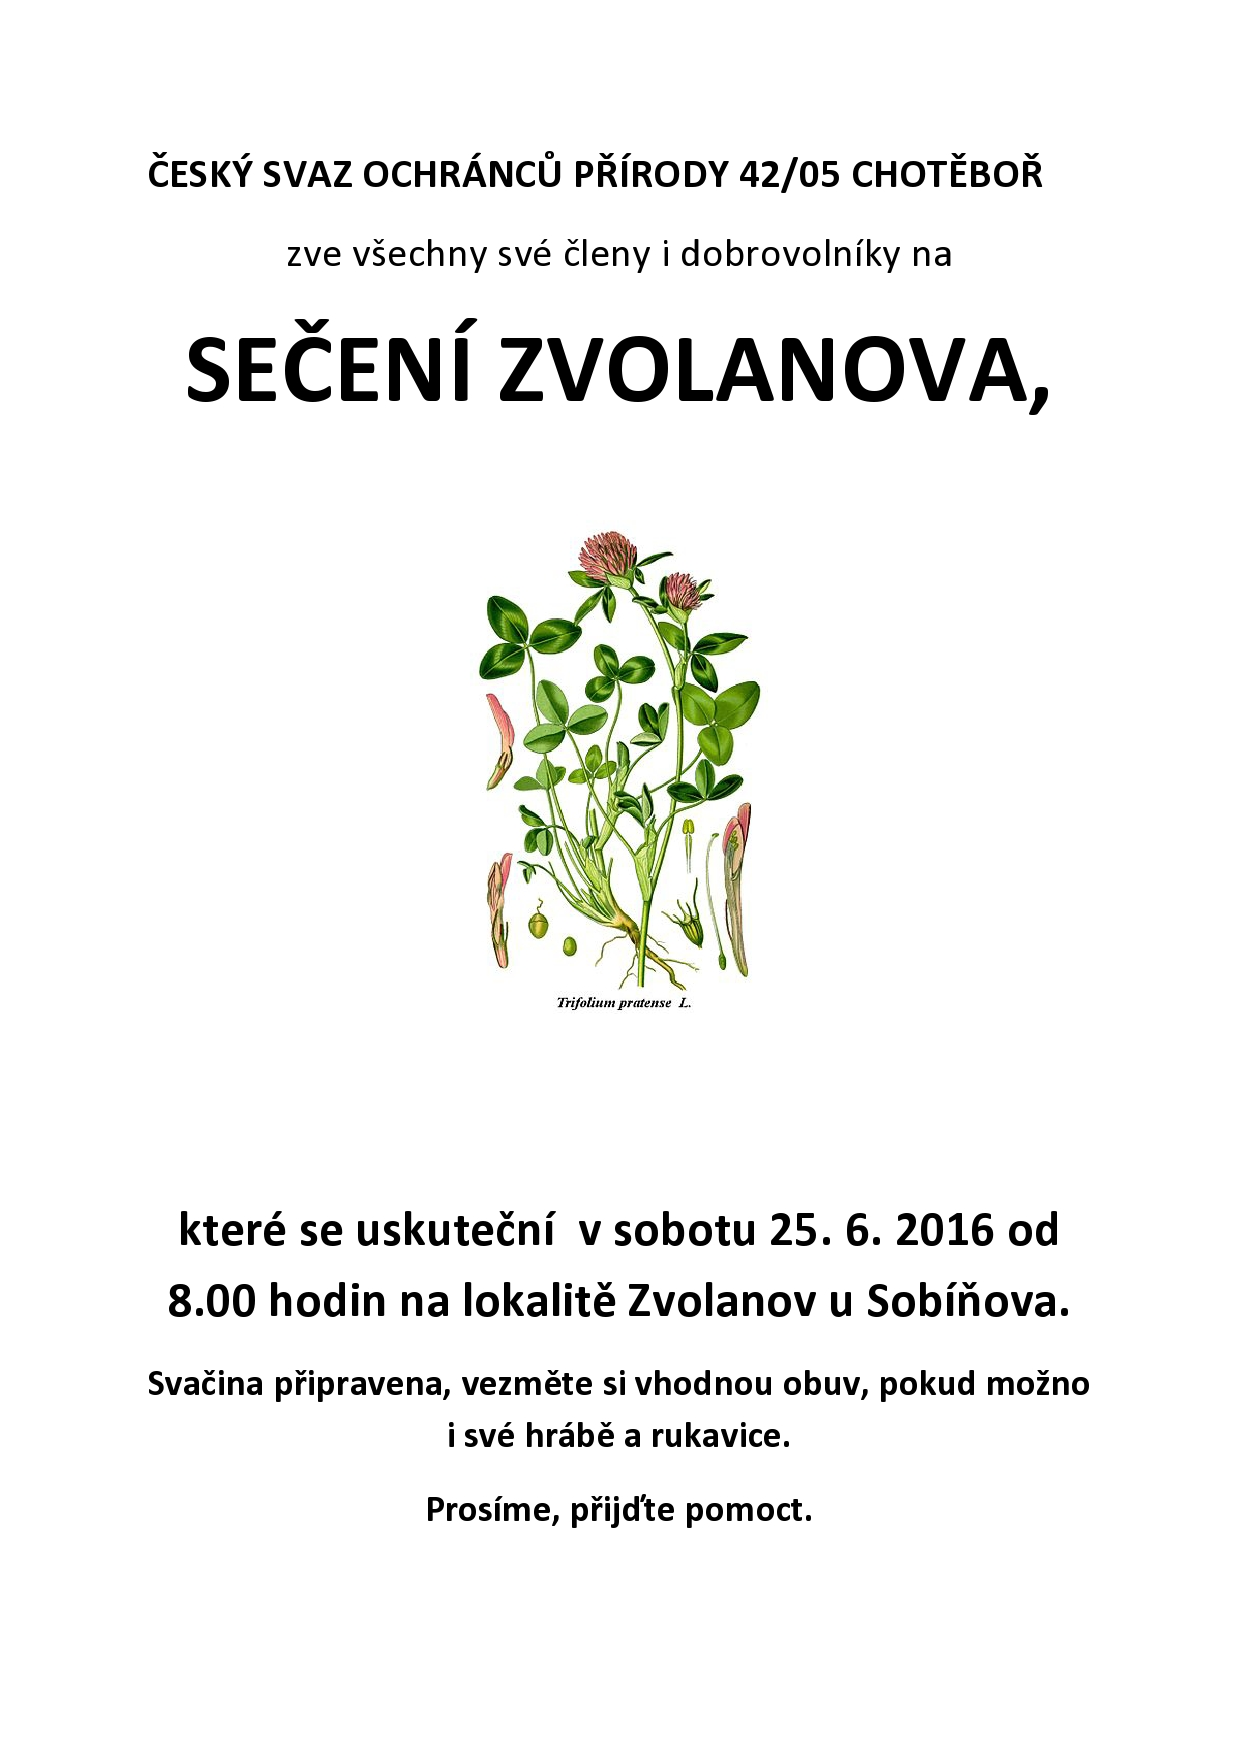 Kosení Zvolanova